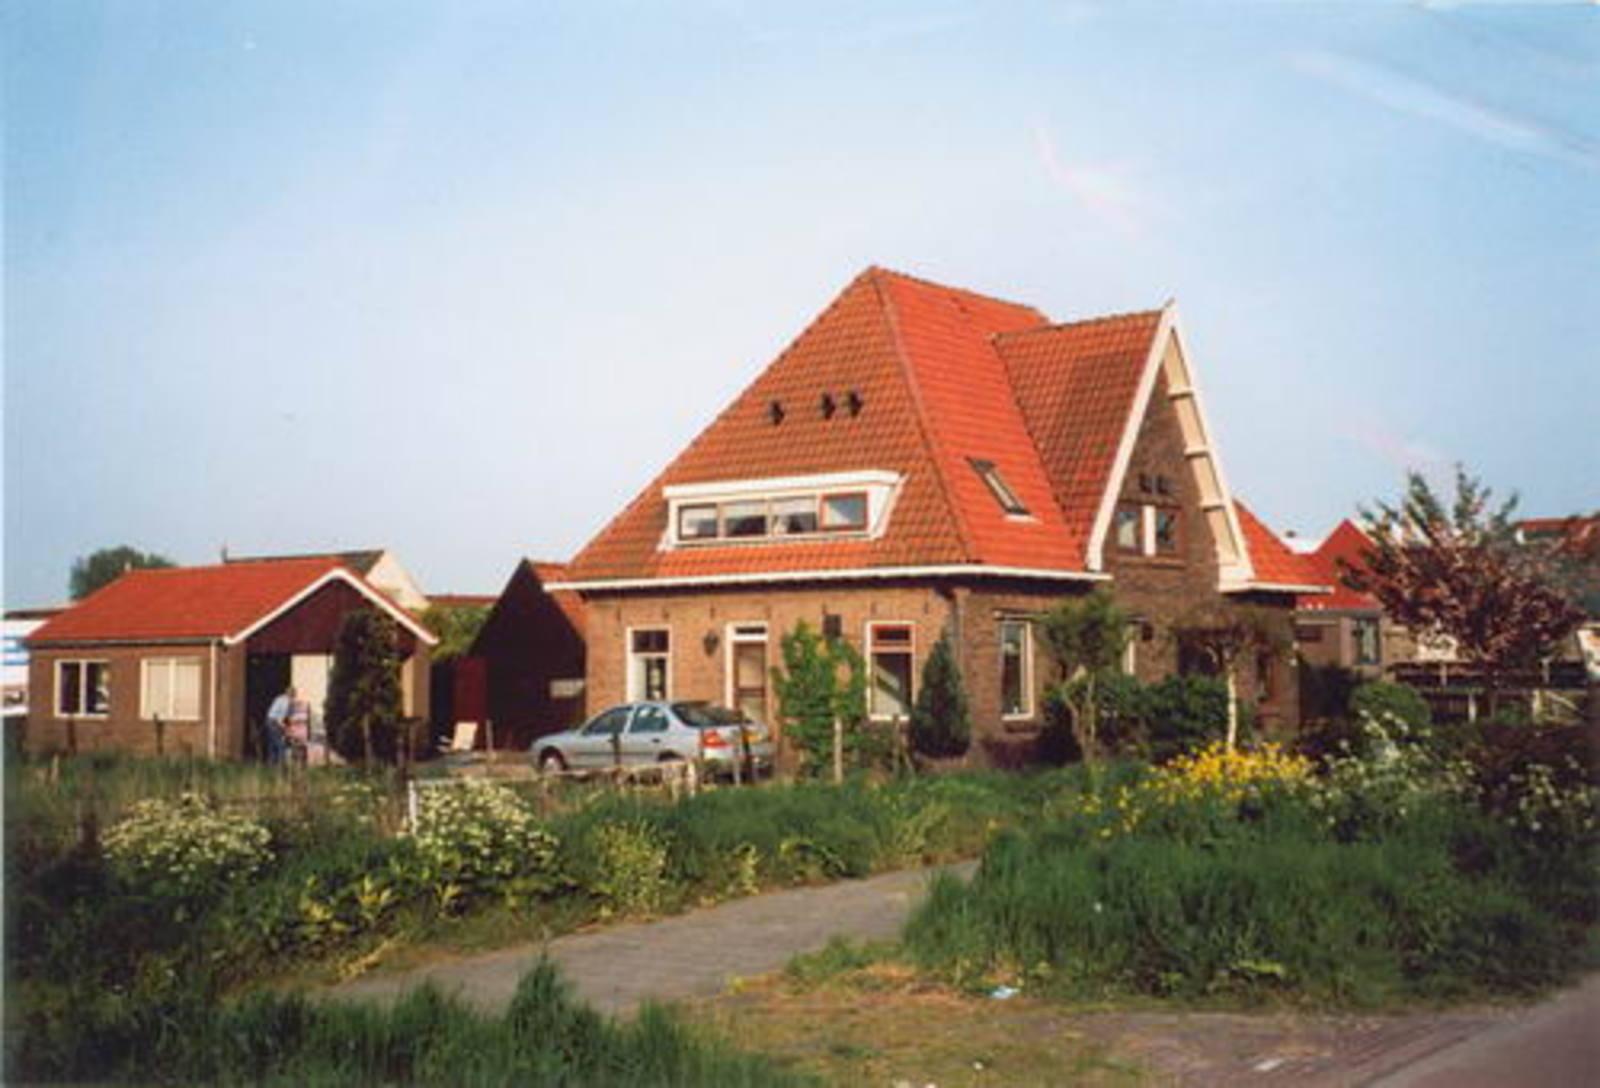 Kruisweg N 0719-717± 1999 Huize Vester en Verhoeve